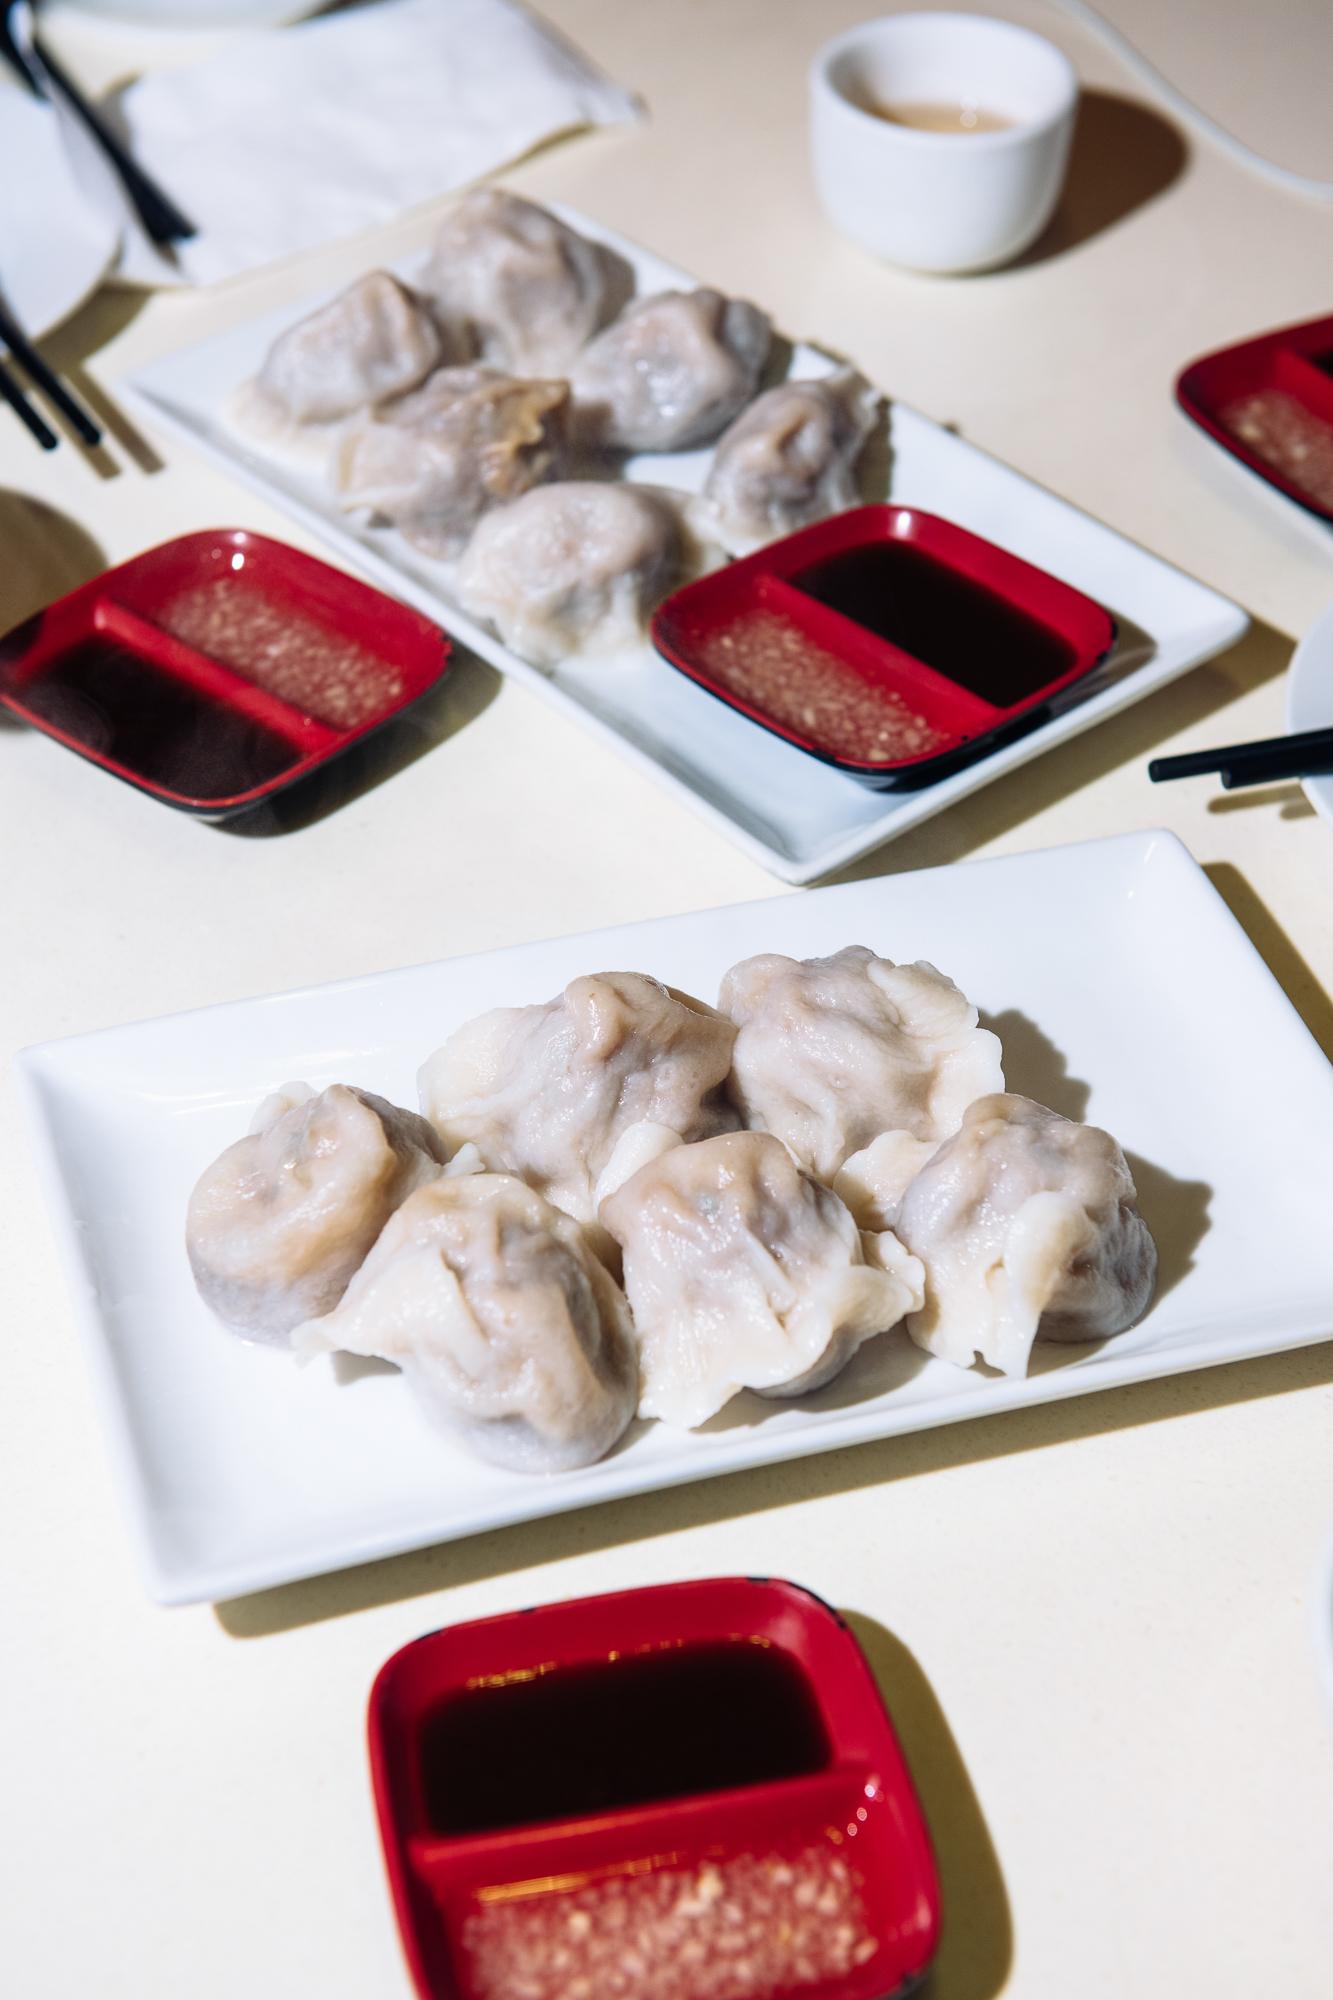 Lamb and duck dumplings at Dumpling Galaxy in Flushing, Queens